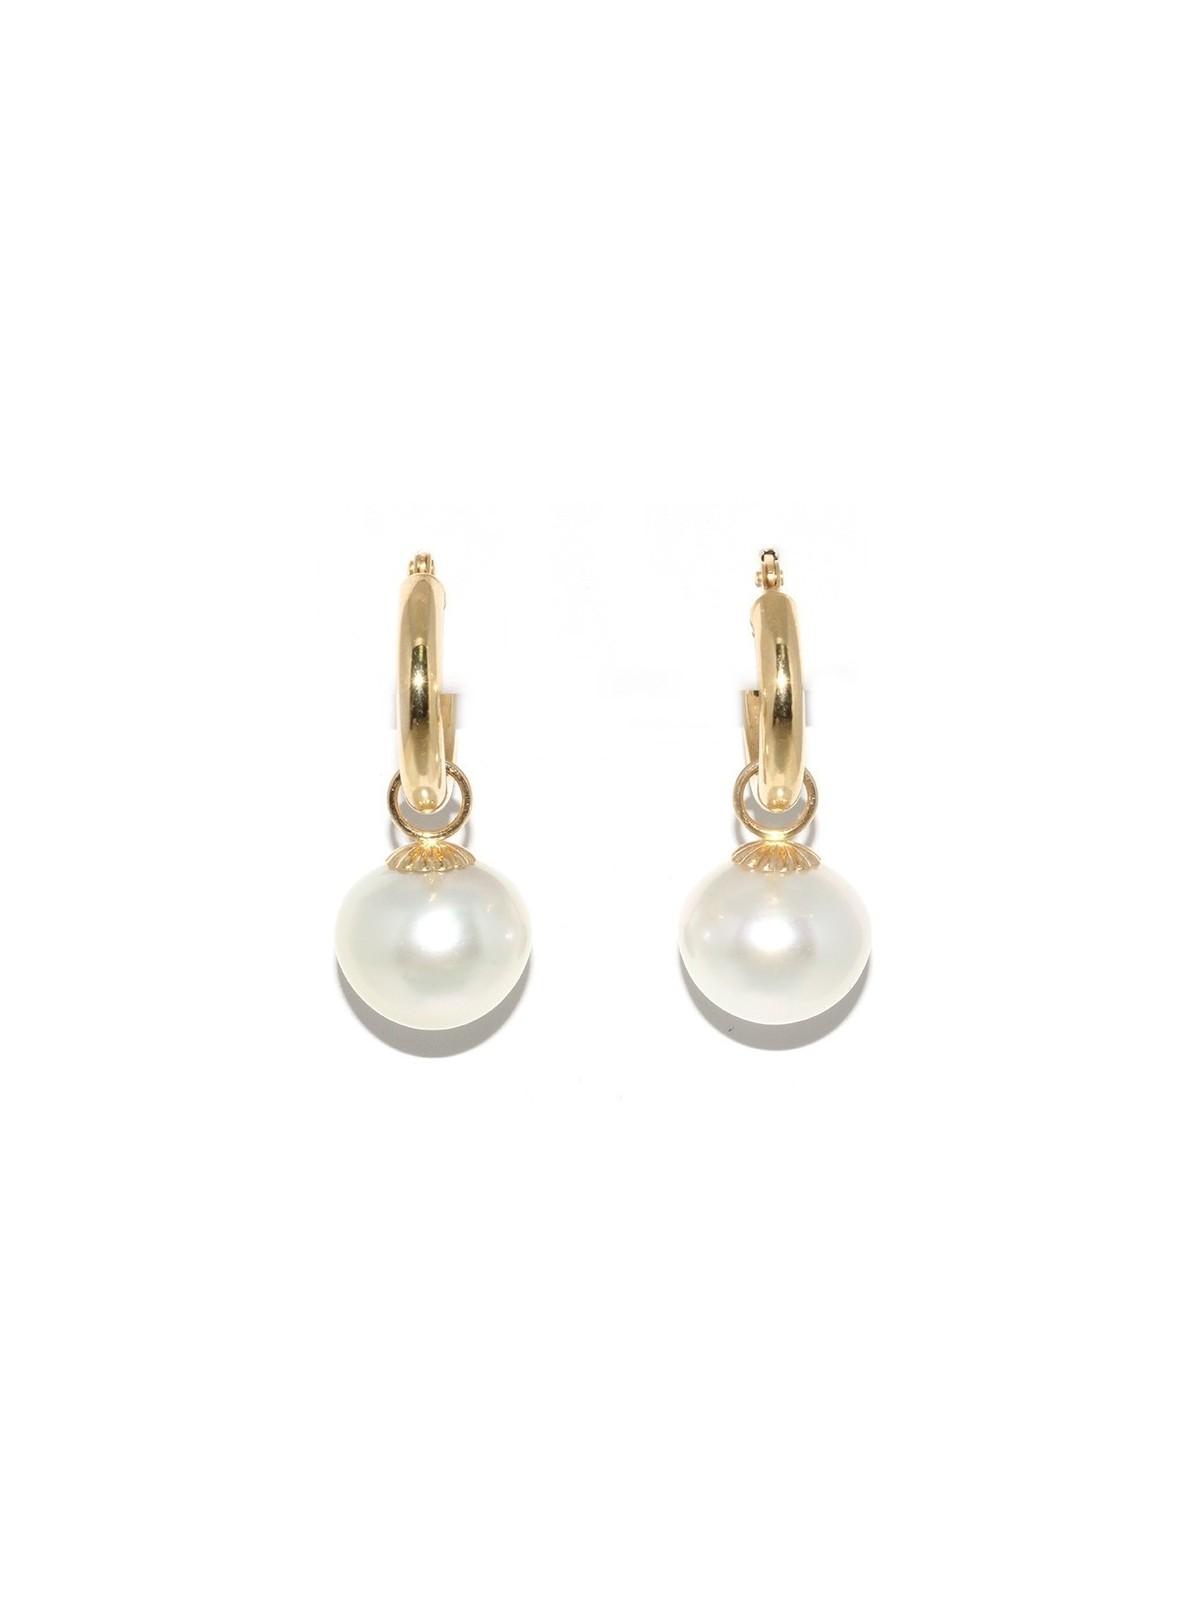 Boucles d'oreilles créoles Faanui Moea Perles - 1